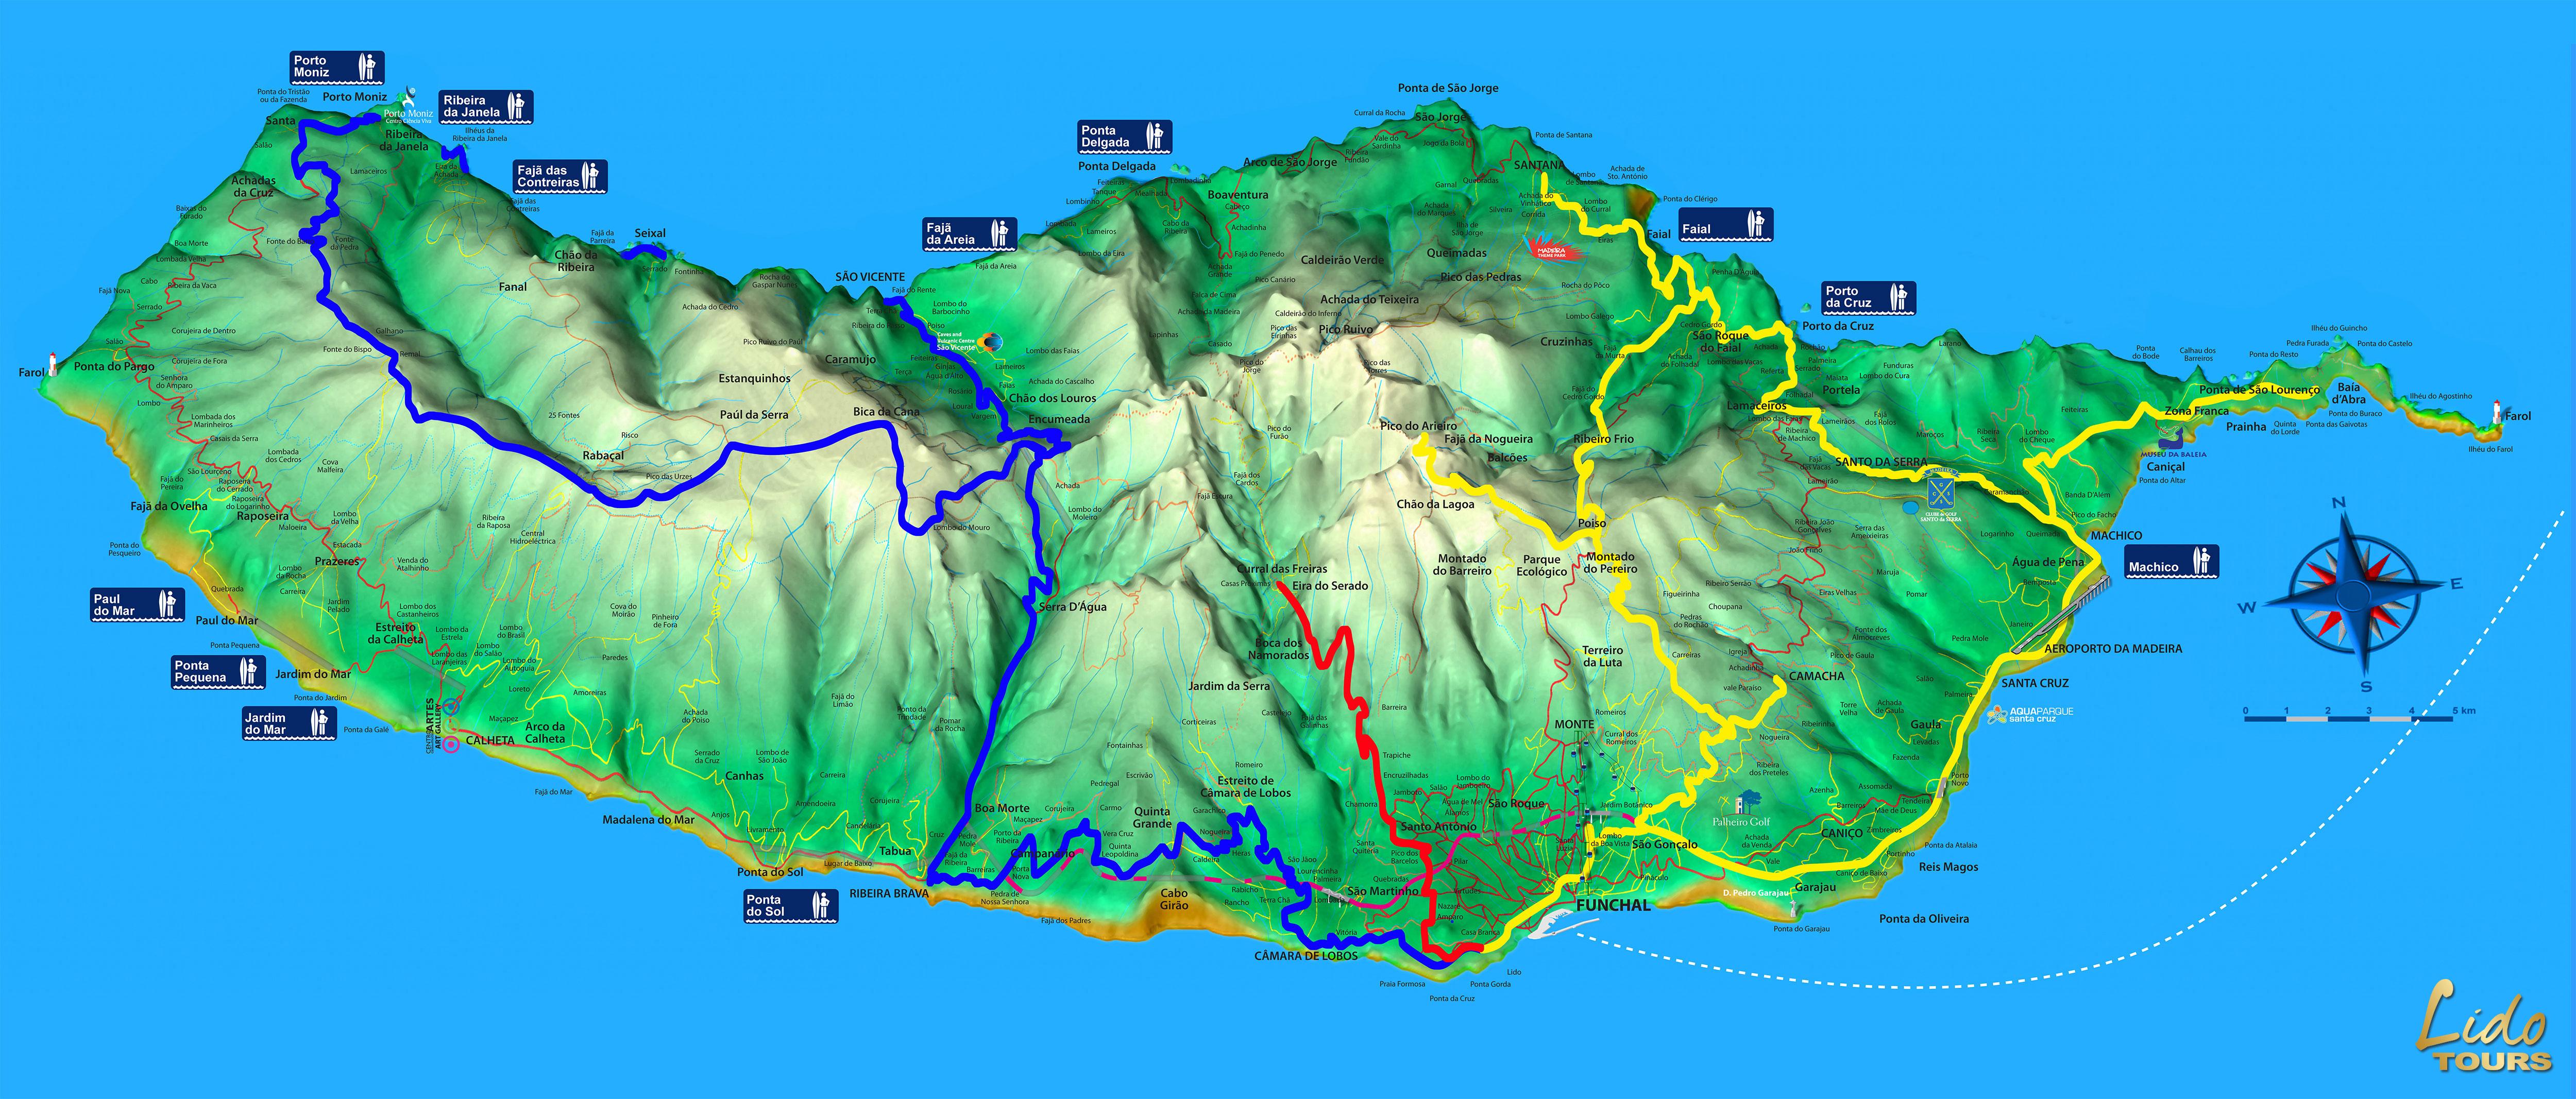 Swtreet Map Of Nuns Island